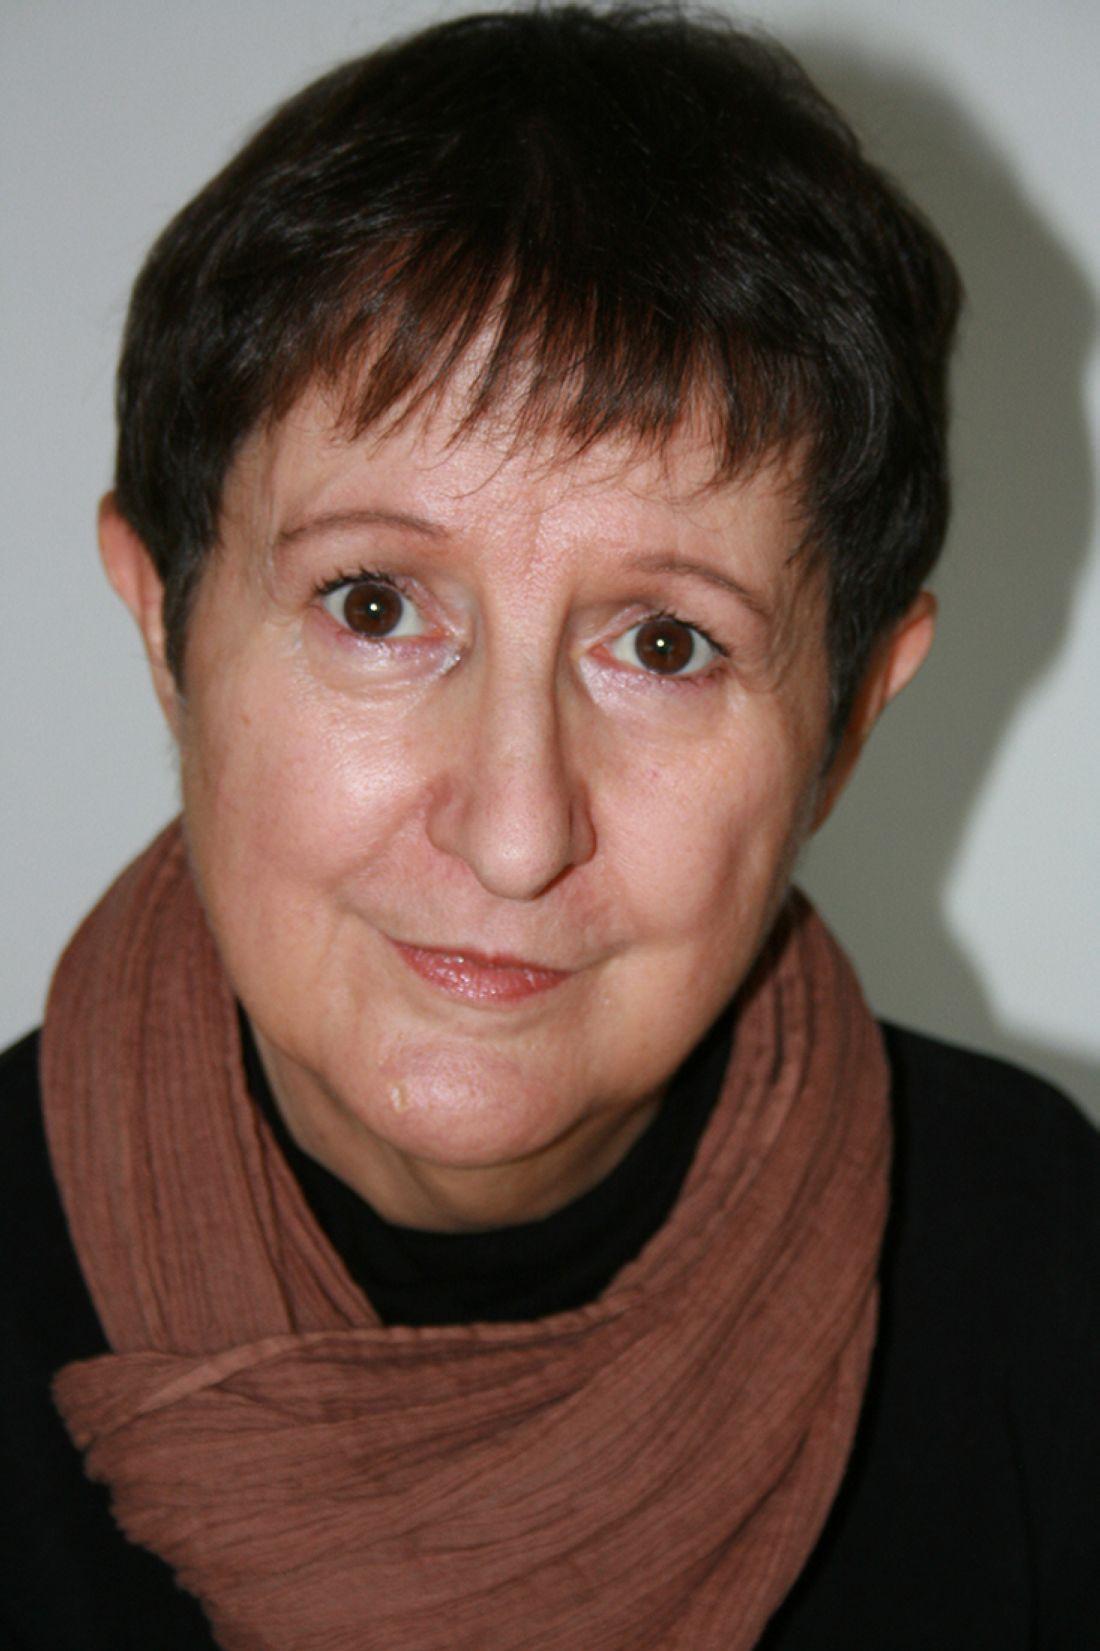 FrançoiseNDONGO